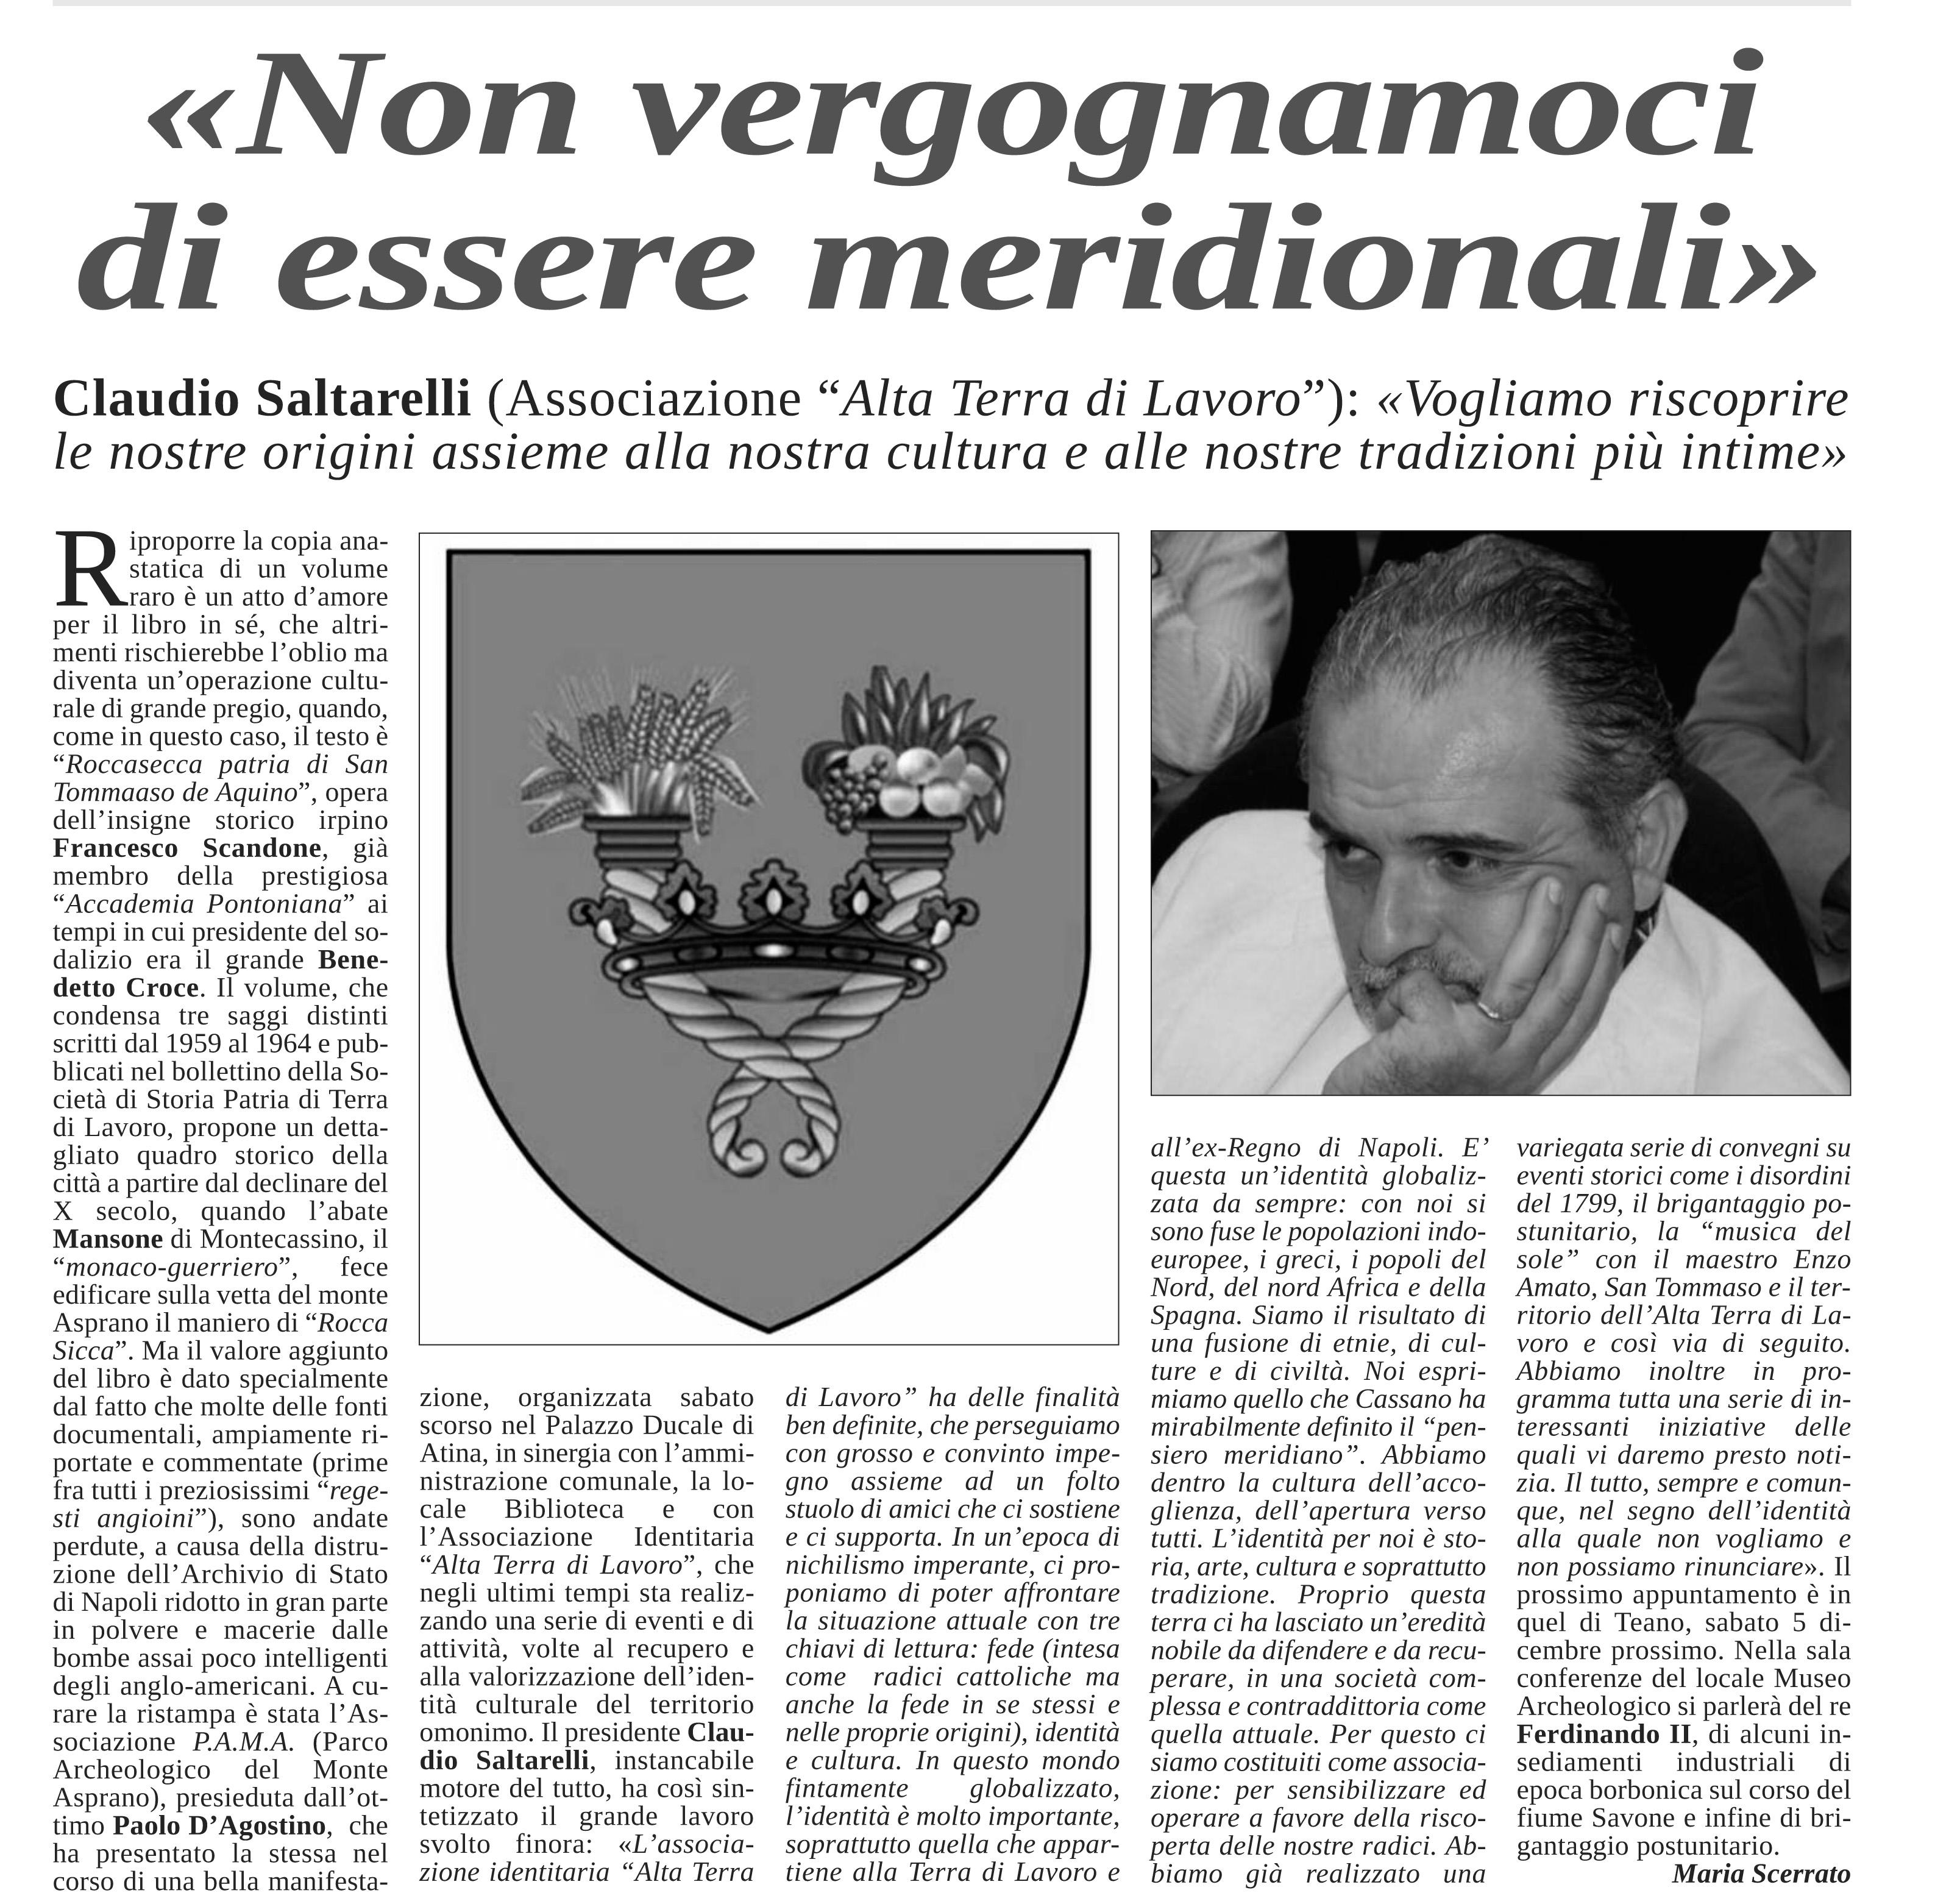 Intervista a Claudio Saltarelli